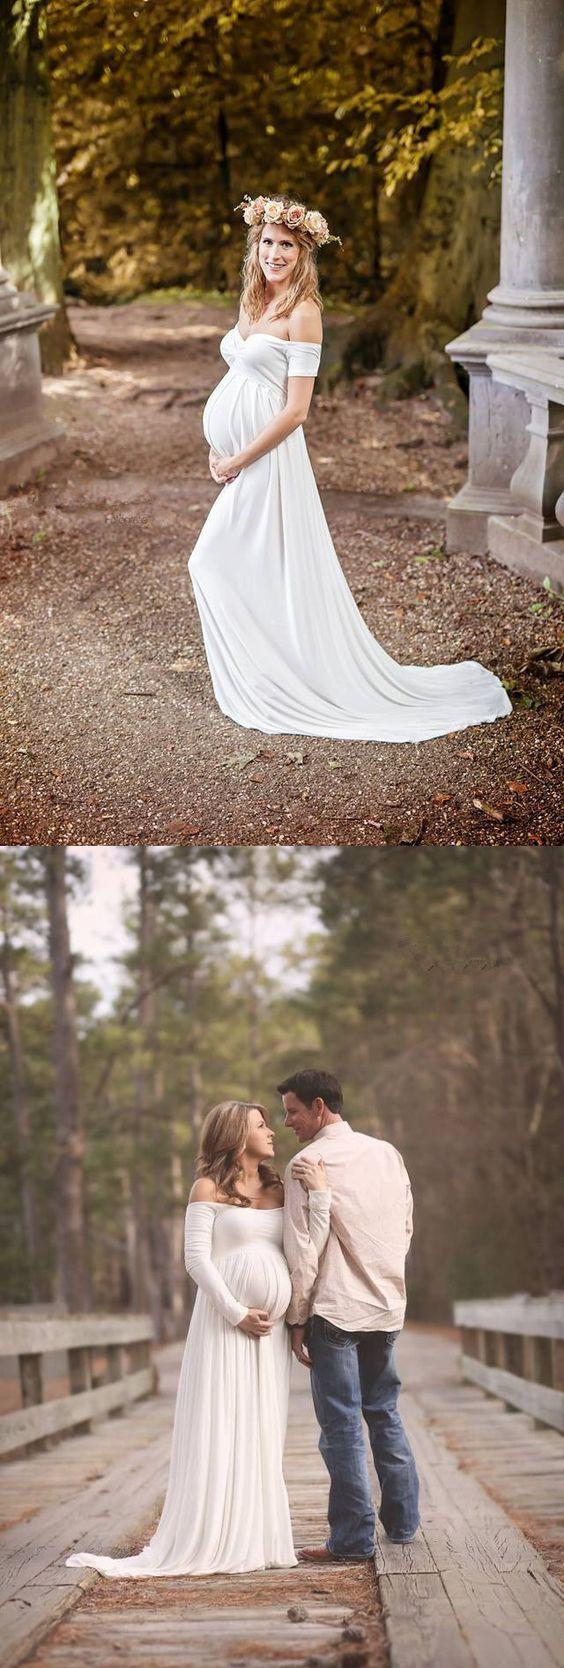 Short maternity wedding dresses   best Wedding dress images on Pinterest  Maternity wedding